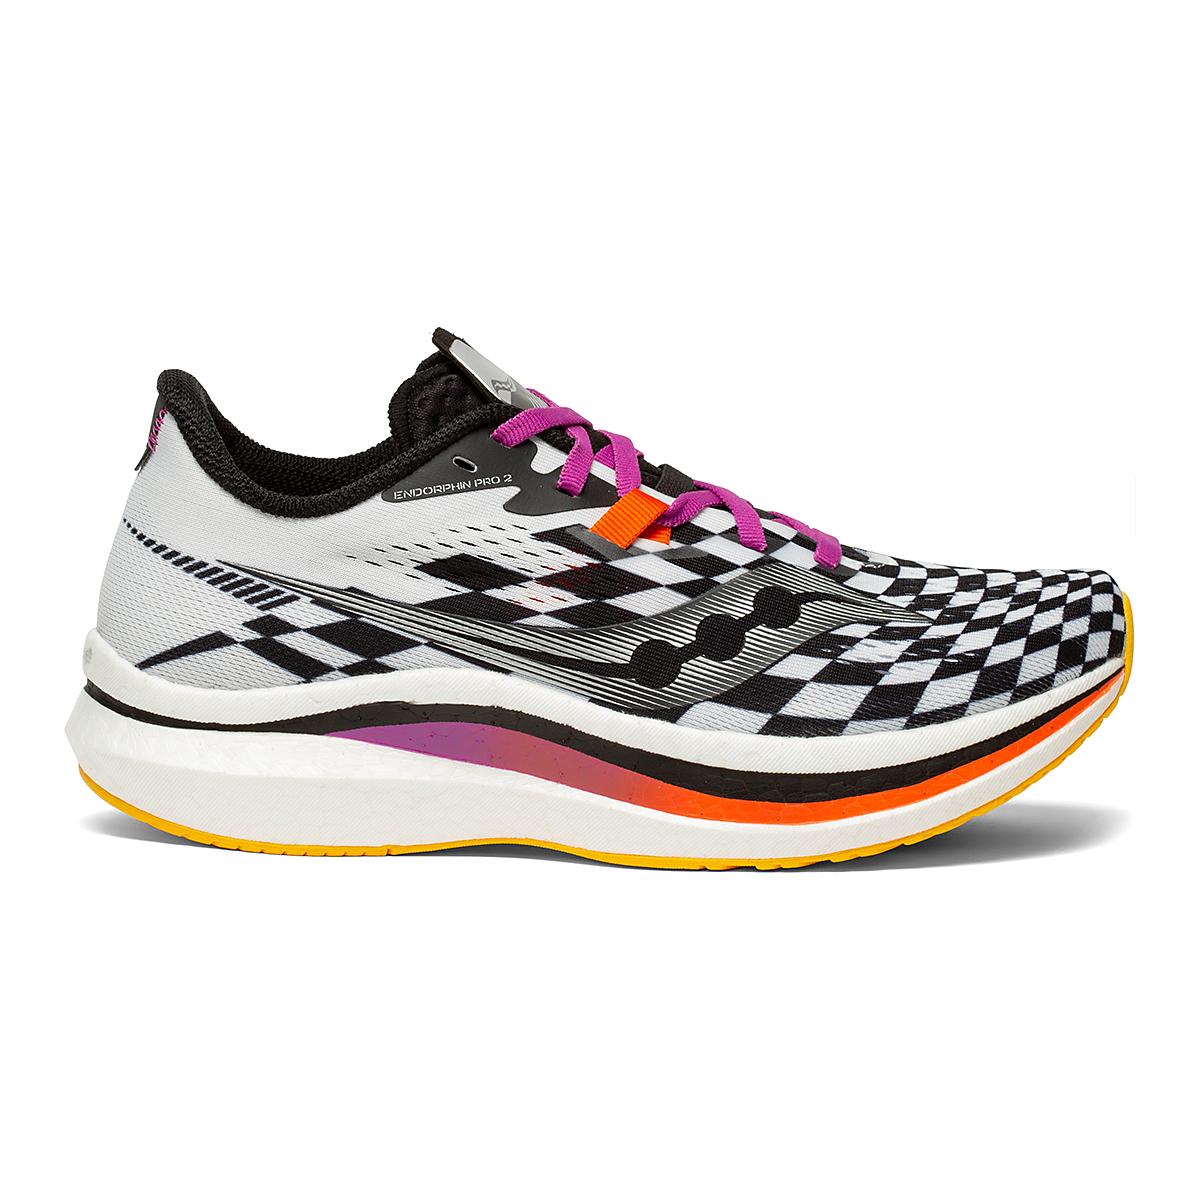 Women's Saucony Endorphin Pro 2 Running Shoe - Color: Reverie - Size: 5 - Width: Regular, Reverie, large, image 1